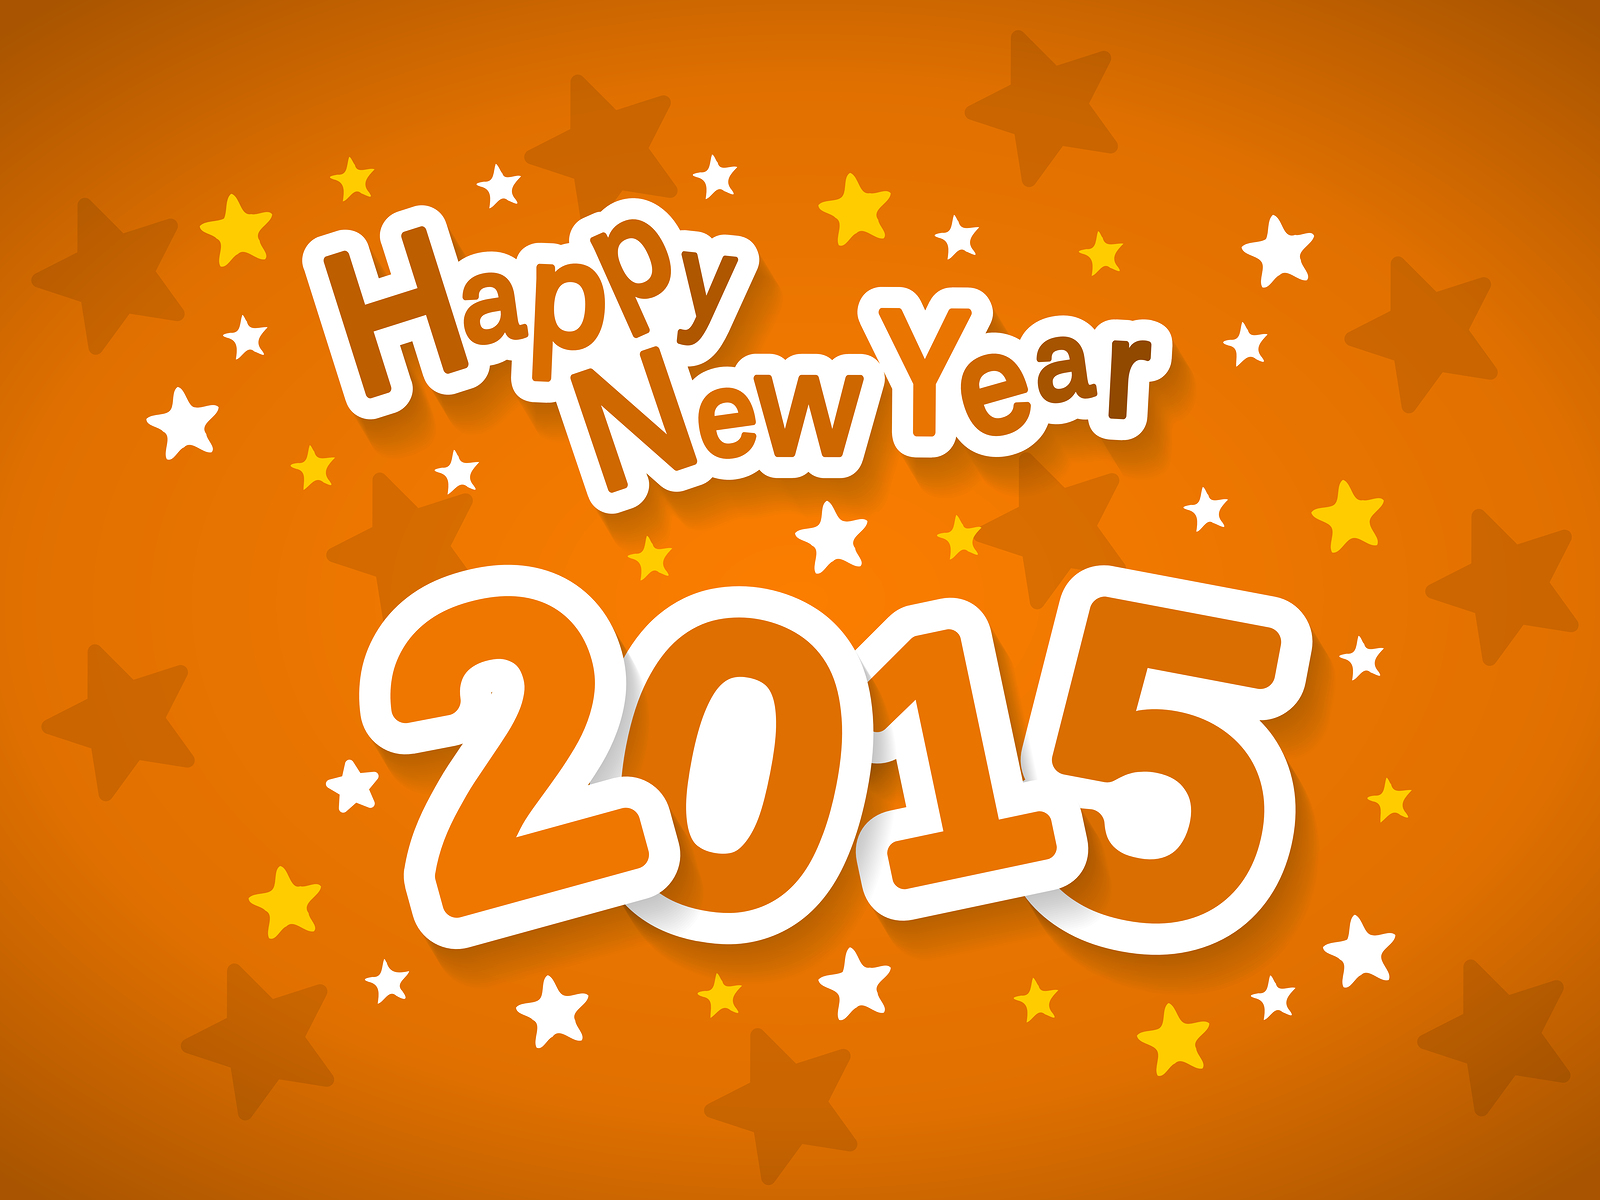 Happy New Year 2015 Orange Wallpaper